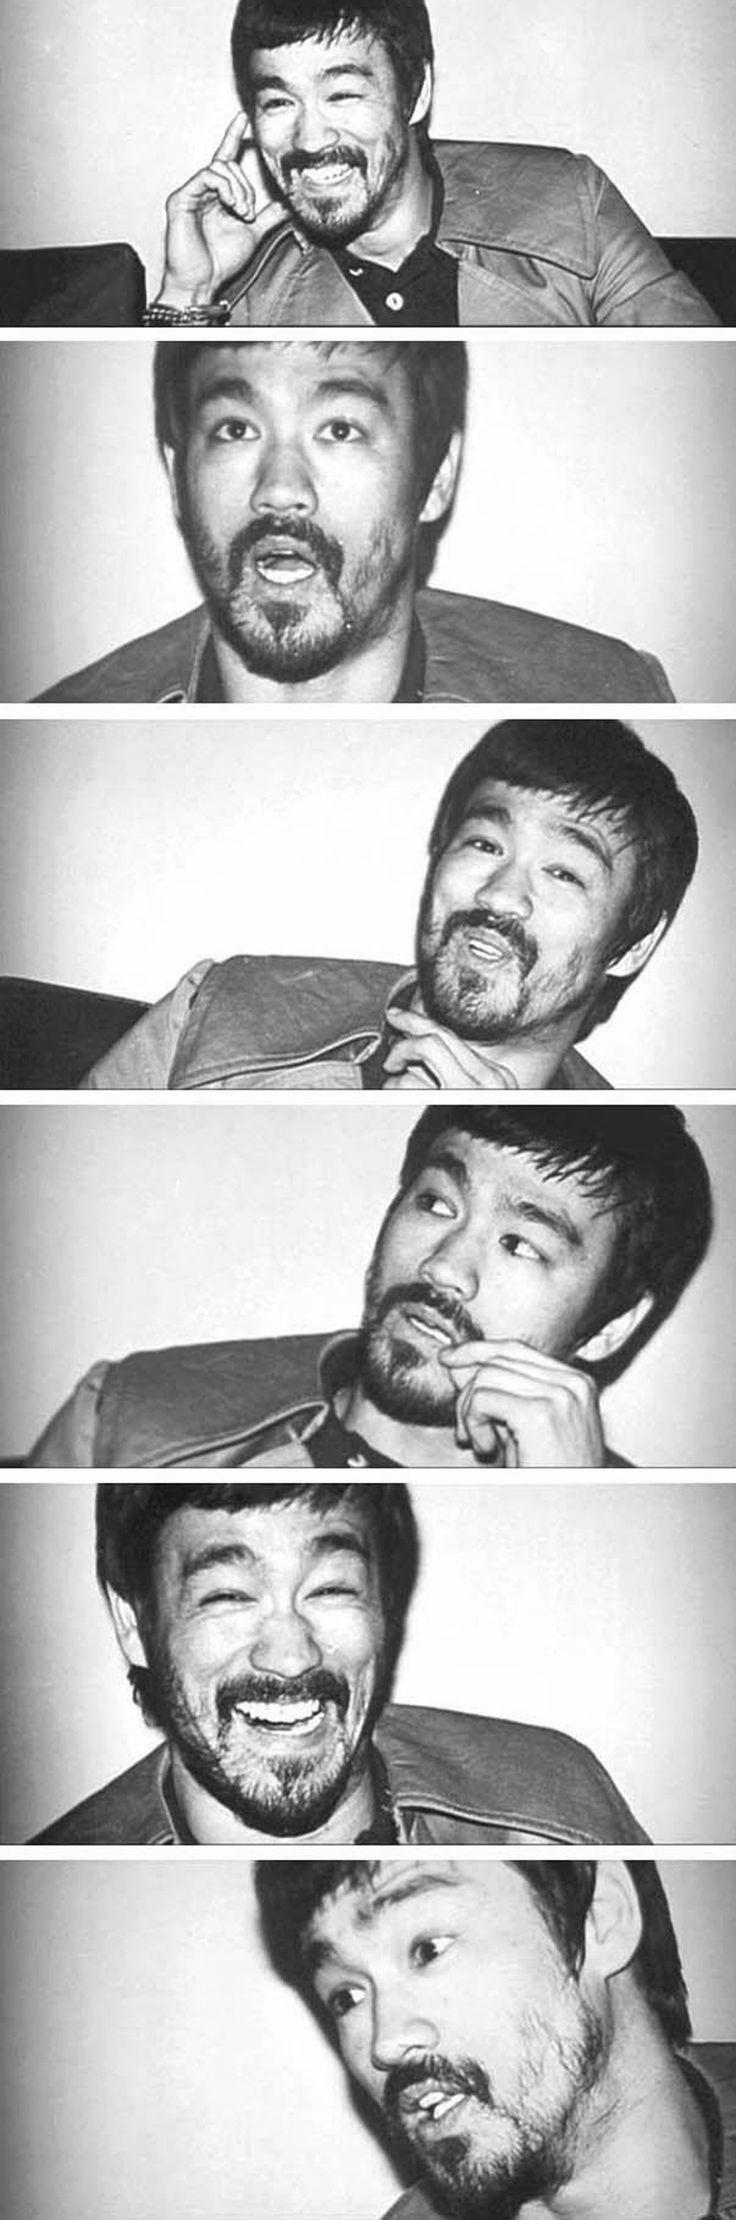 Bruce Lee. Loving the beard!